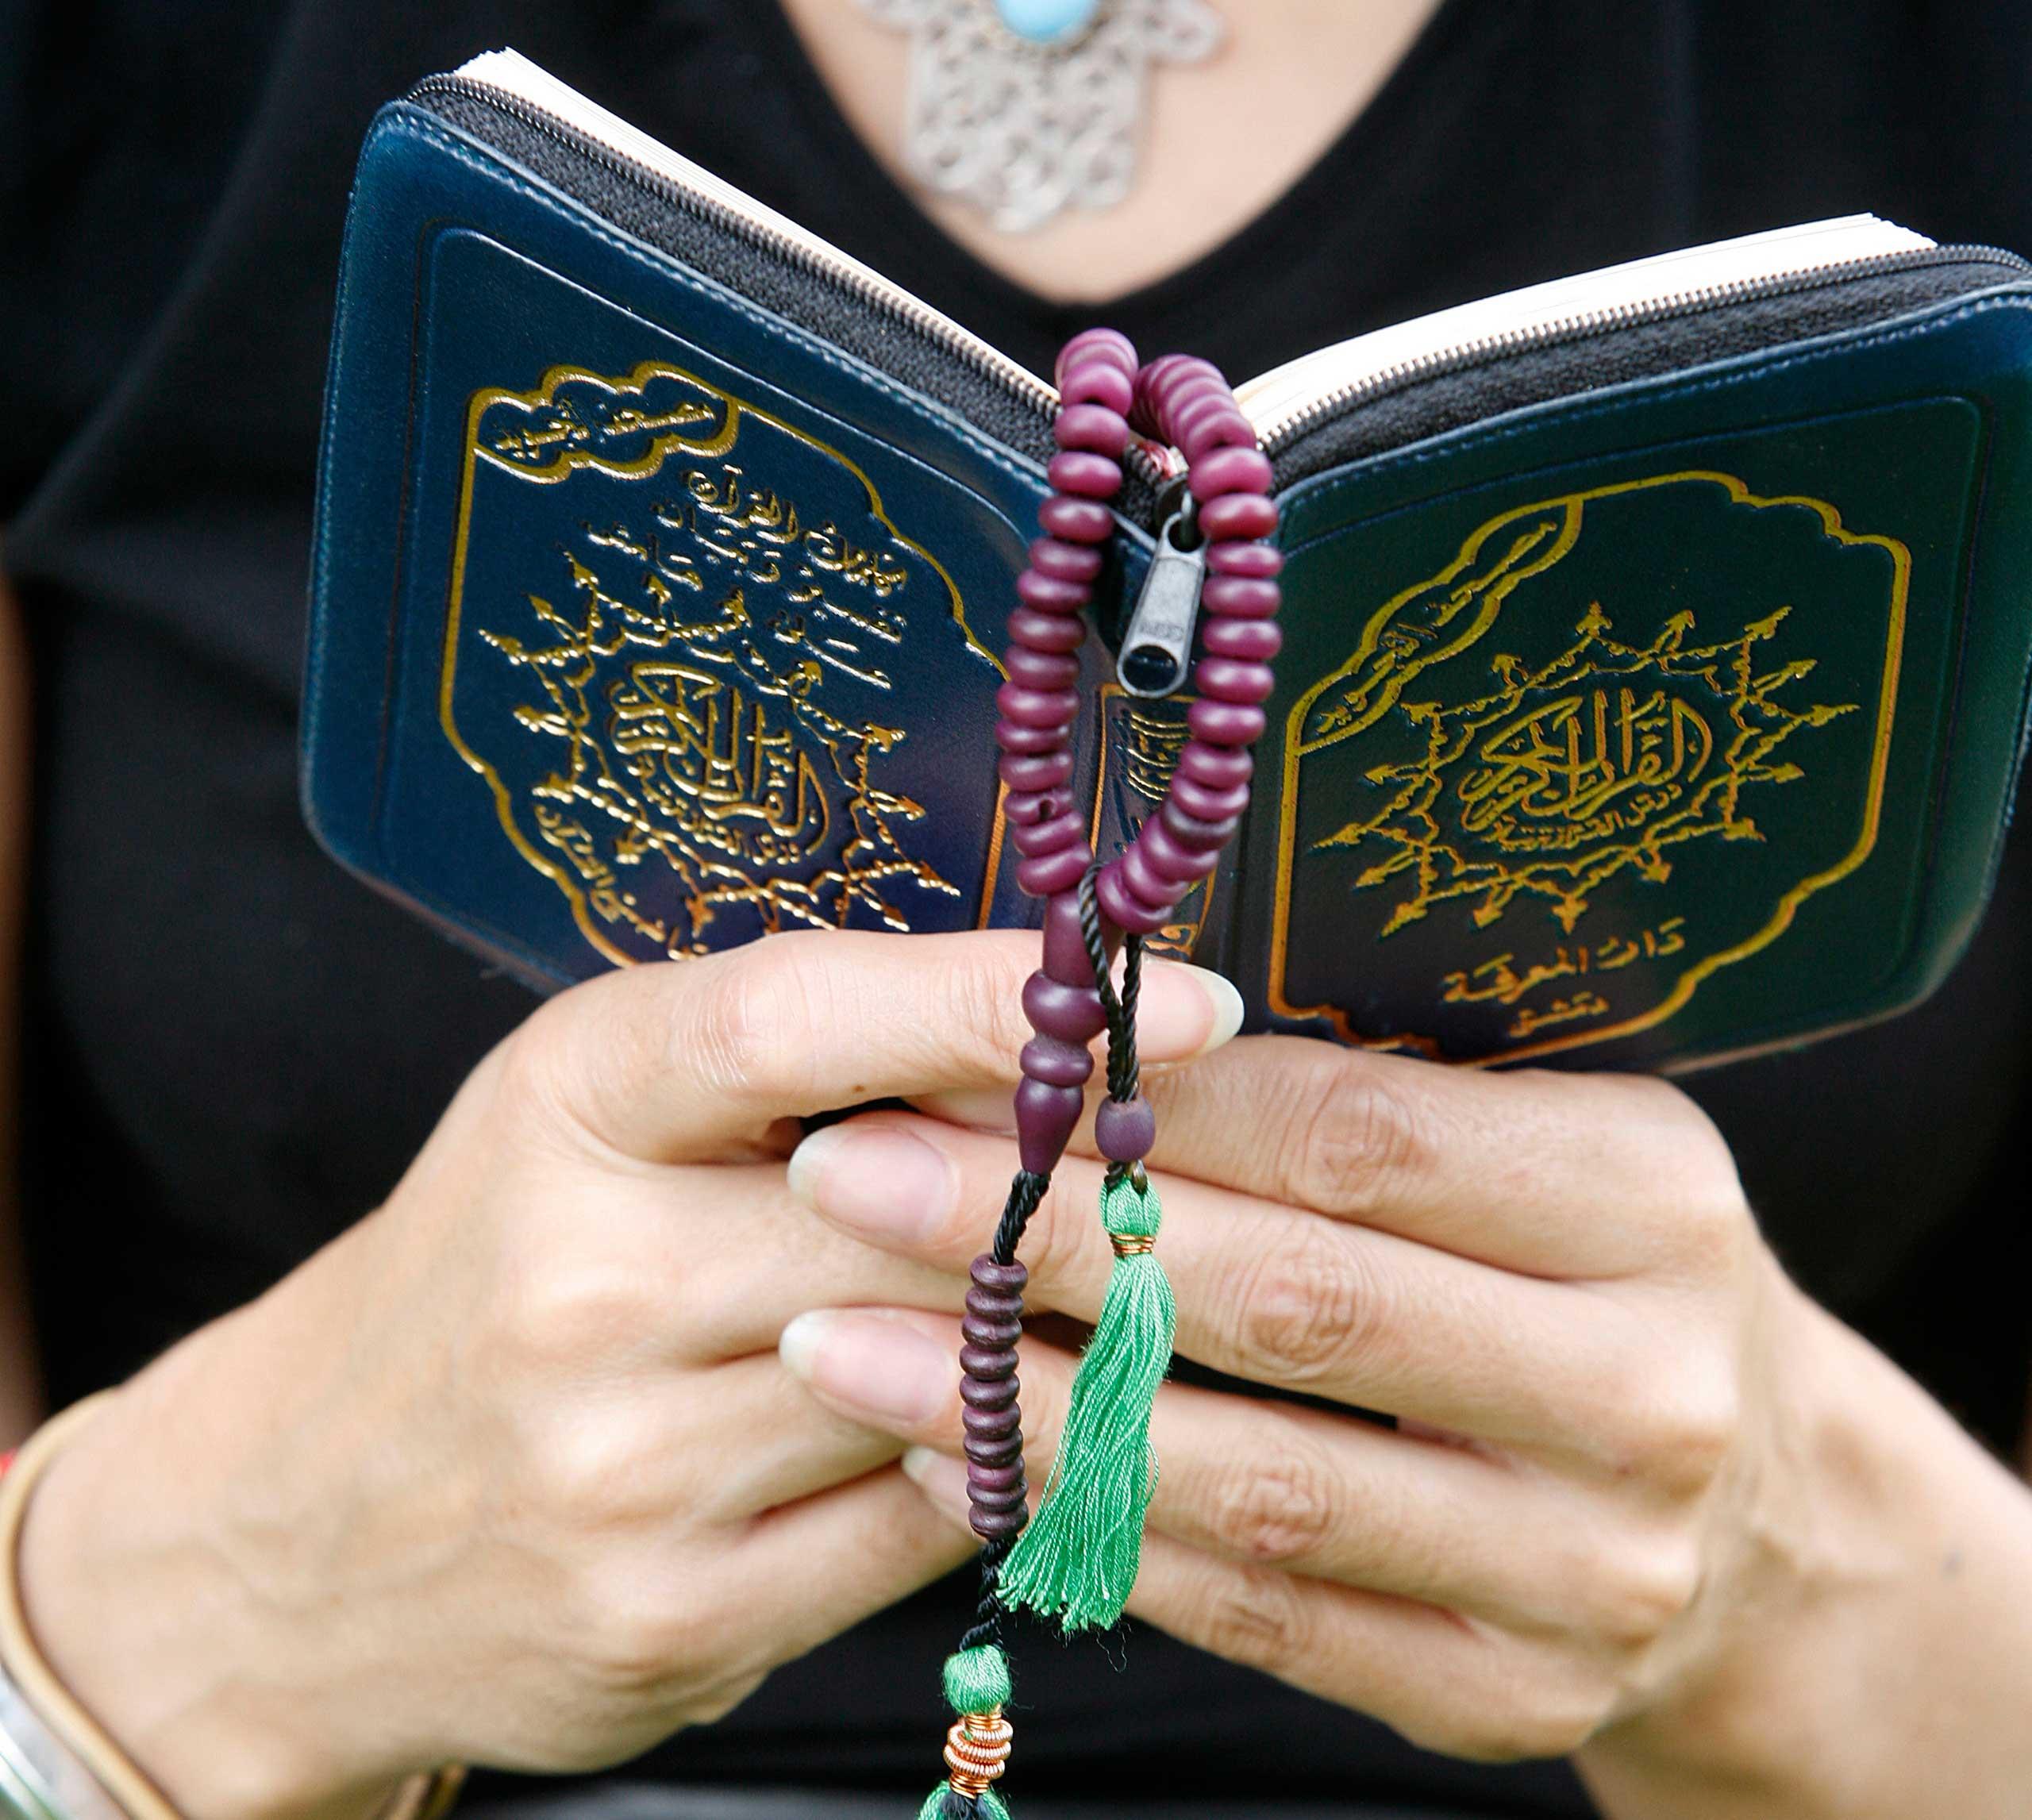 Woman reading the Koran.